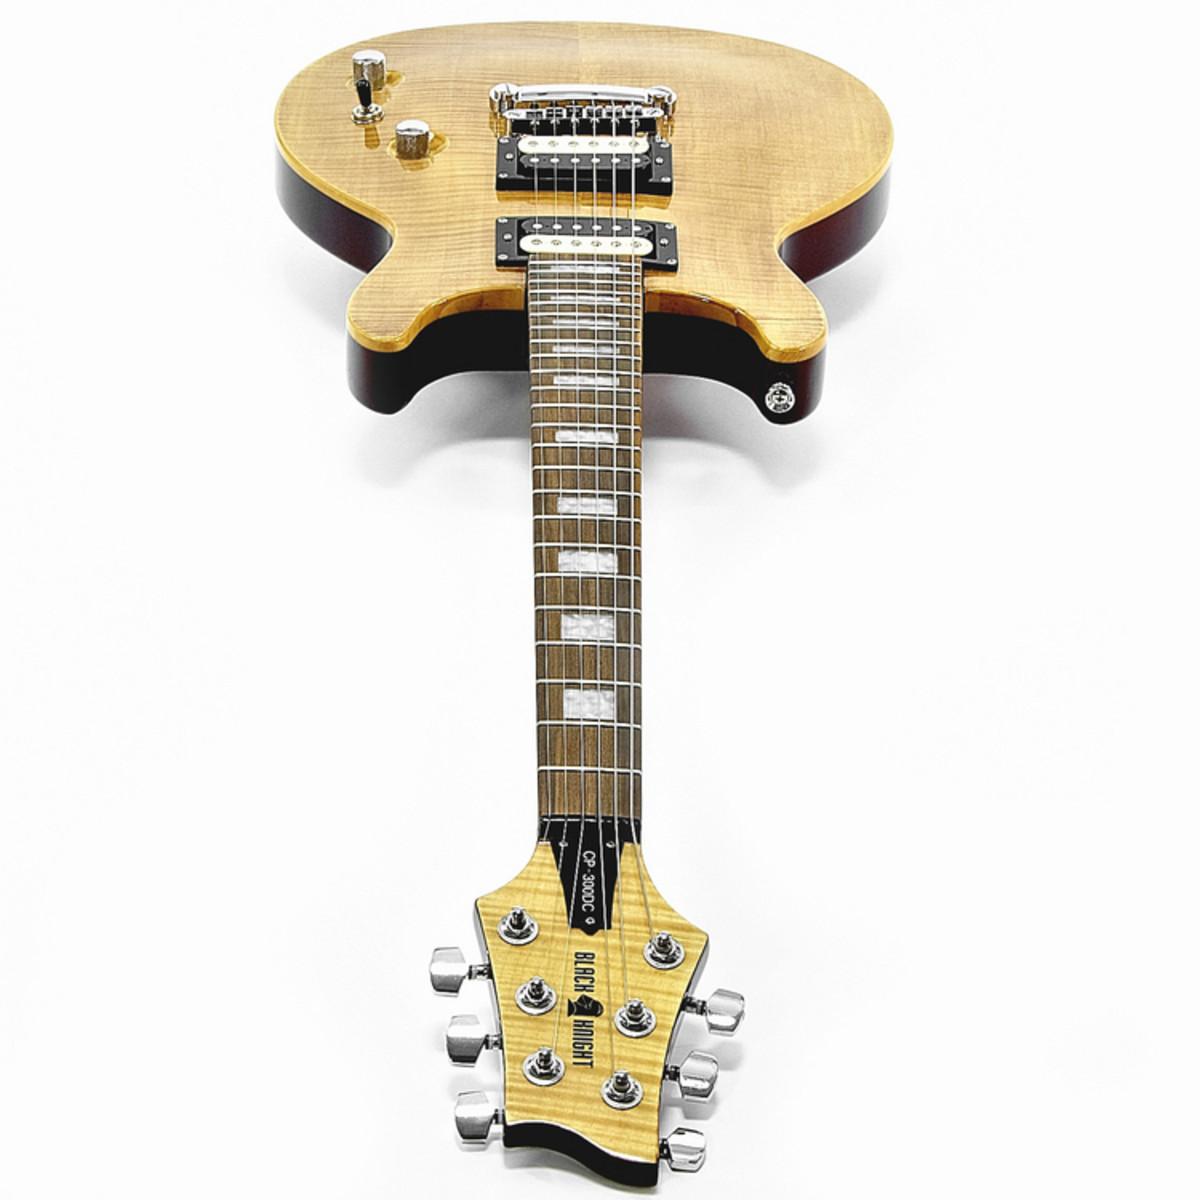 Black Knight CP-300DC Double Cutaway E-Gitarre bei Gear4music